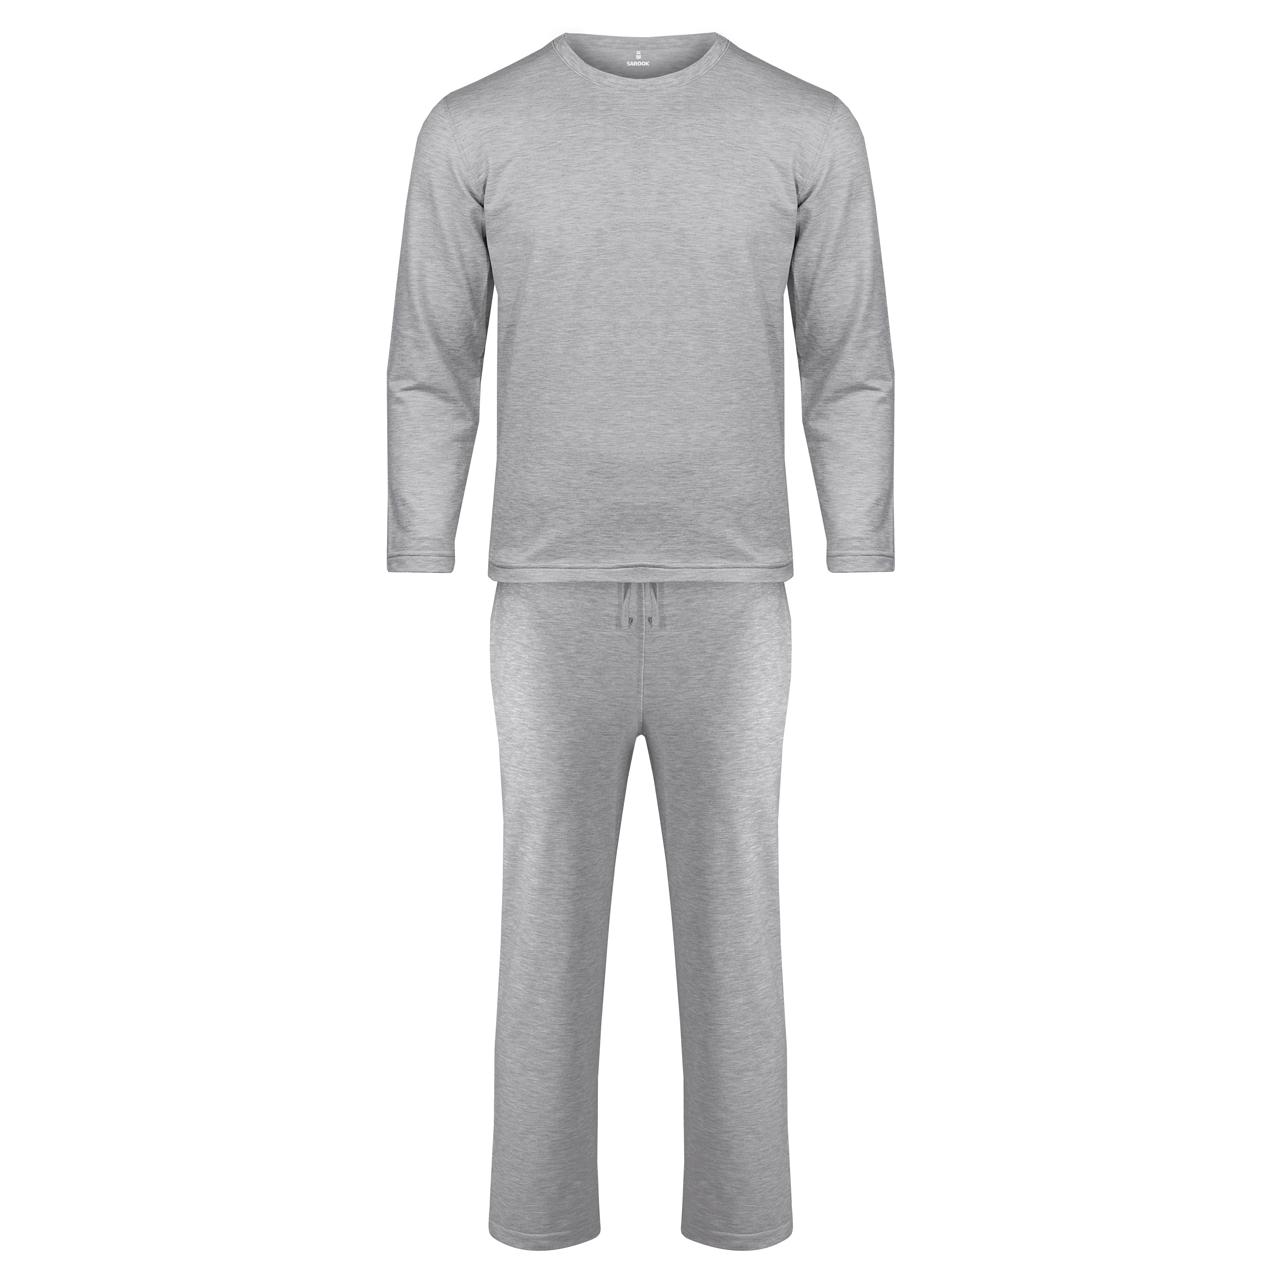 تصویر ست تی شرت و شلوار مردانه ساروک مدل کشمیر کد ملانژ سیر